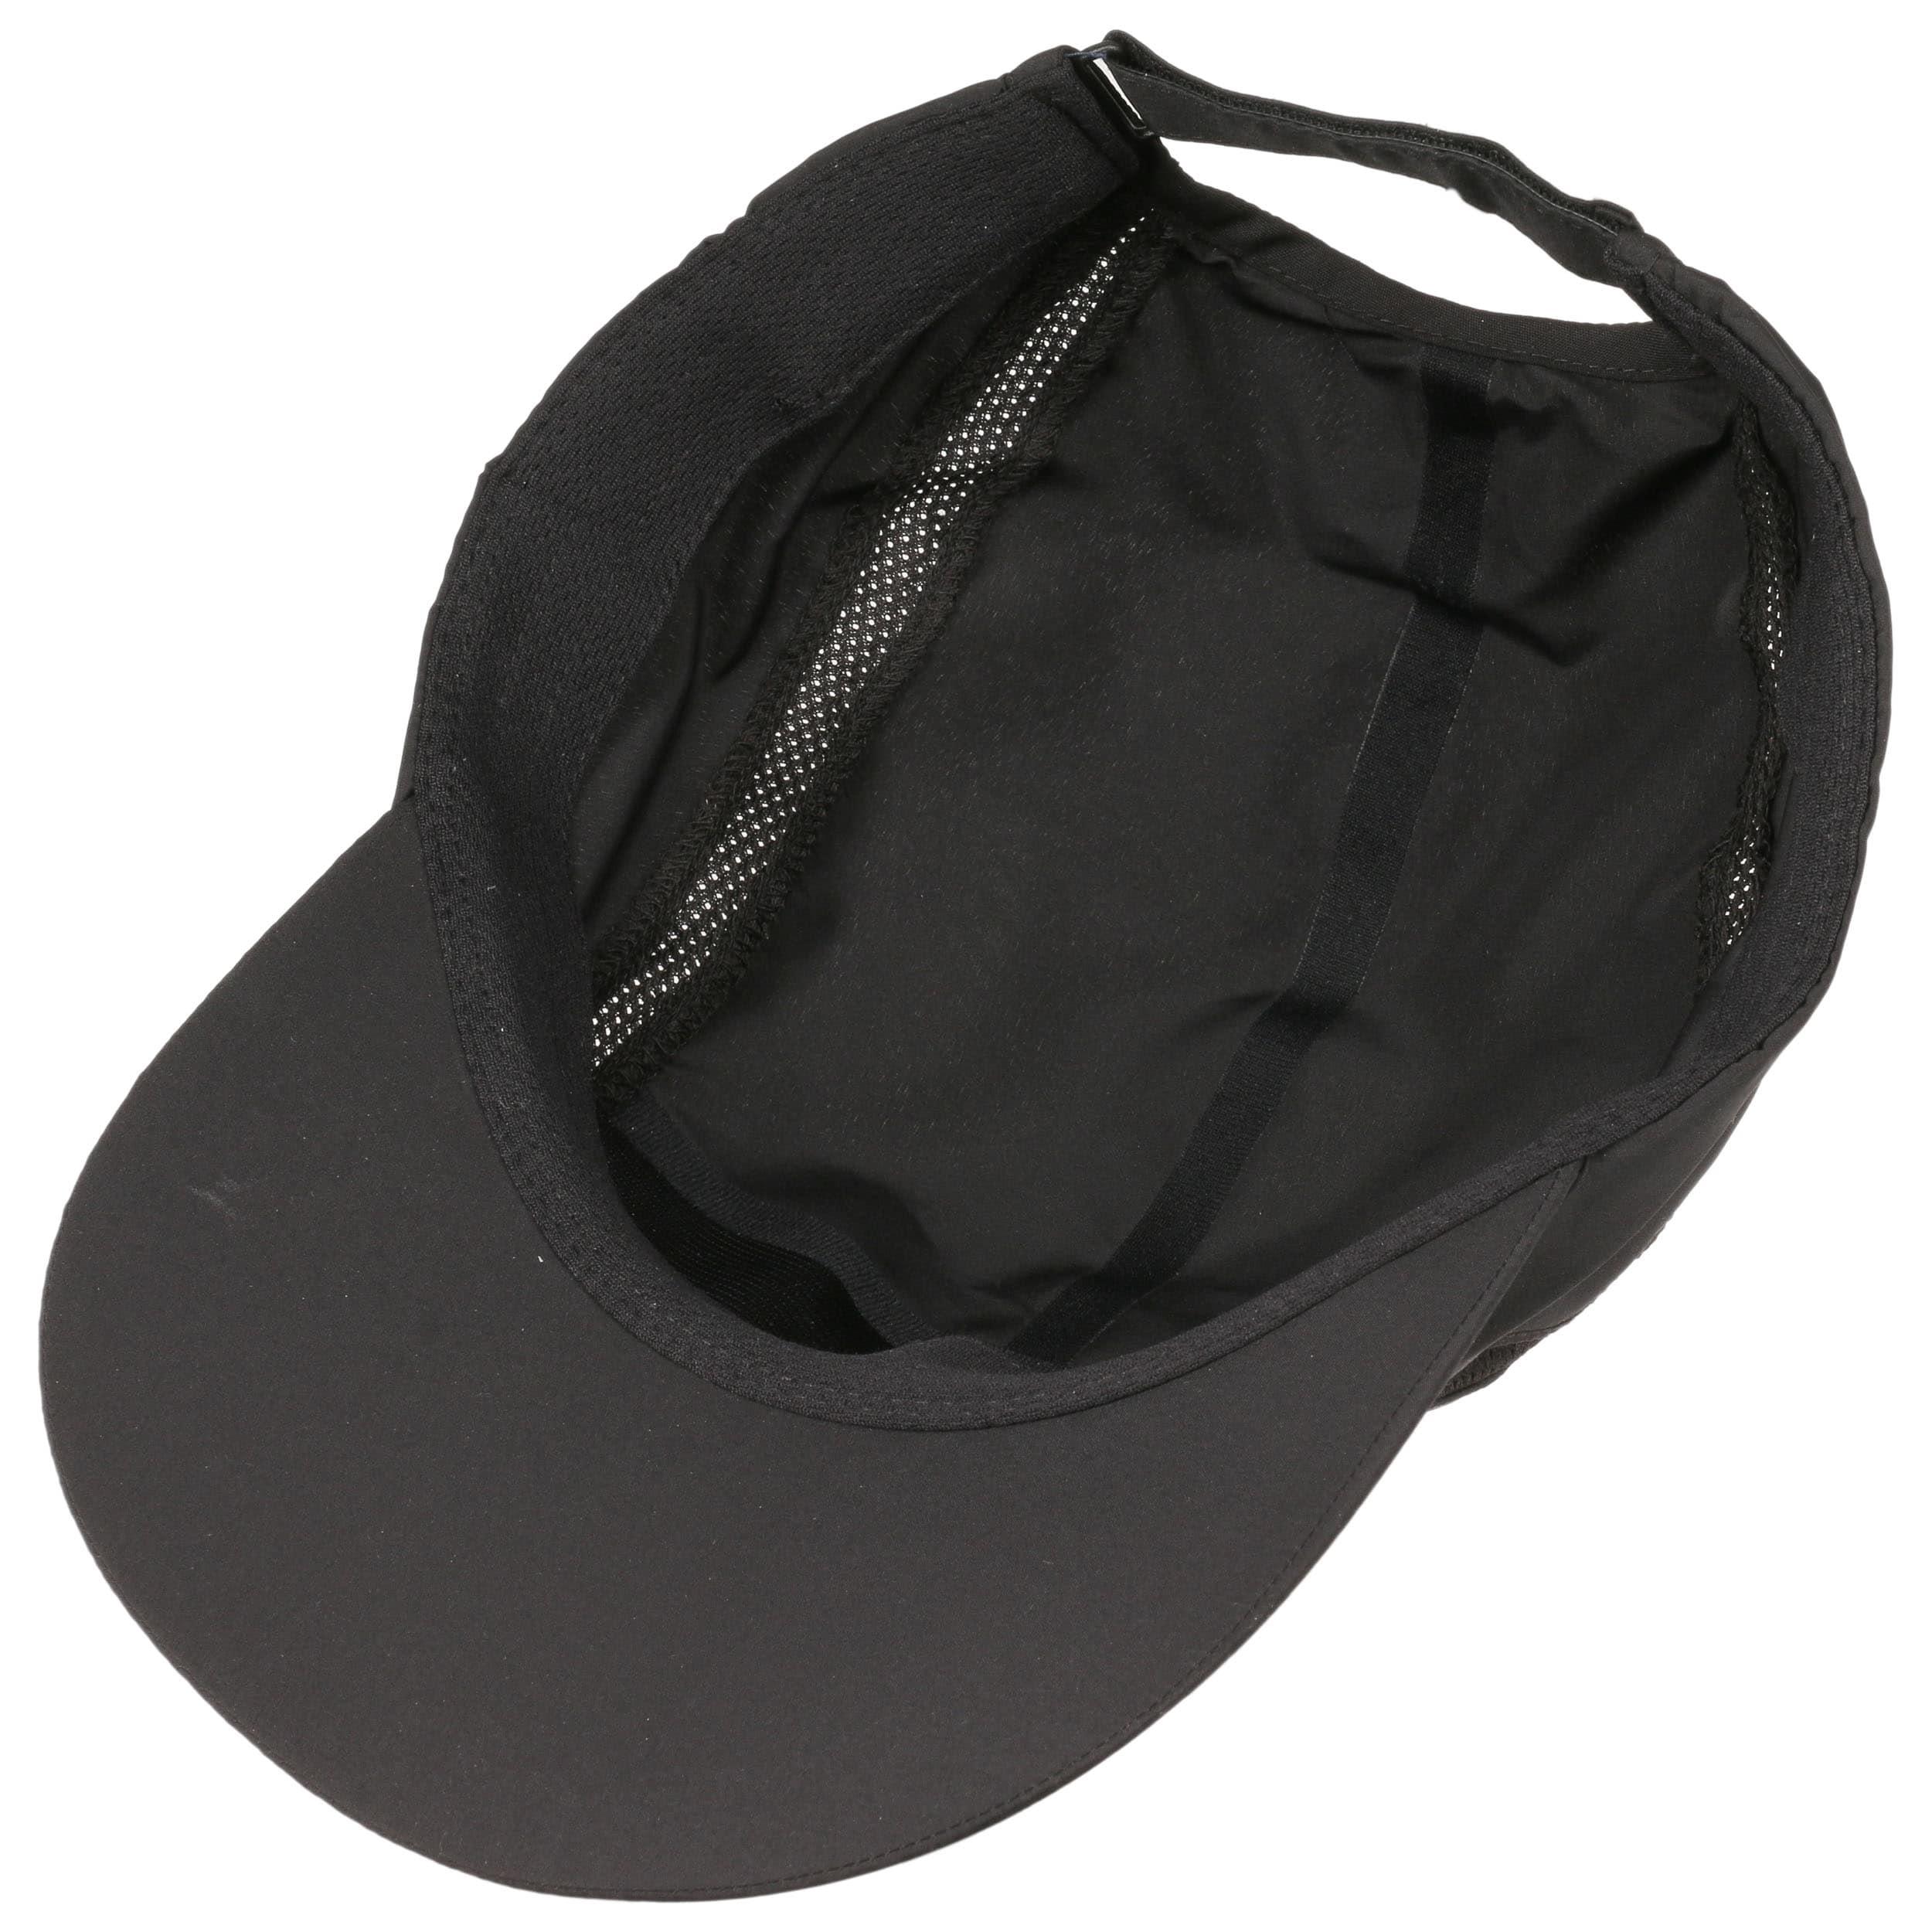 Gorra DuoCELL Tech Performance by PUMA - Gorras - sombreroshop.es e1f277d697a